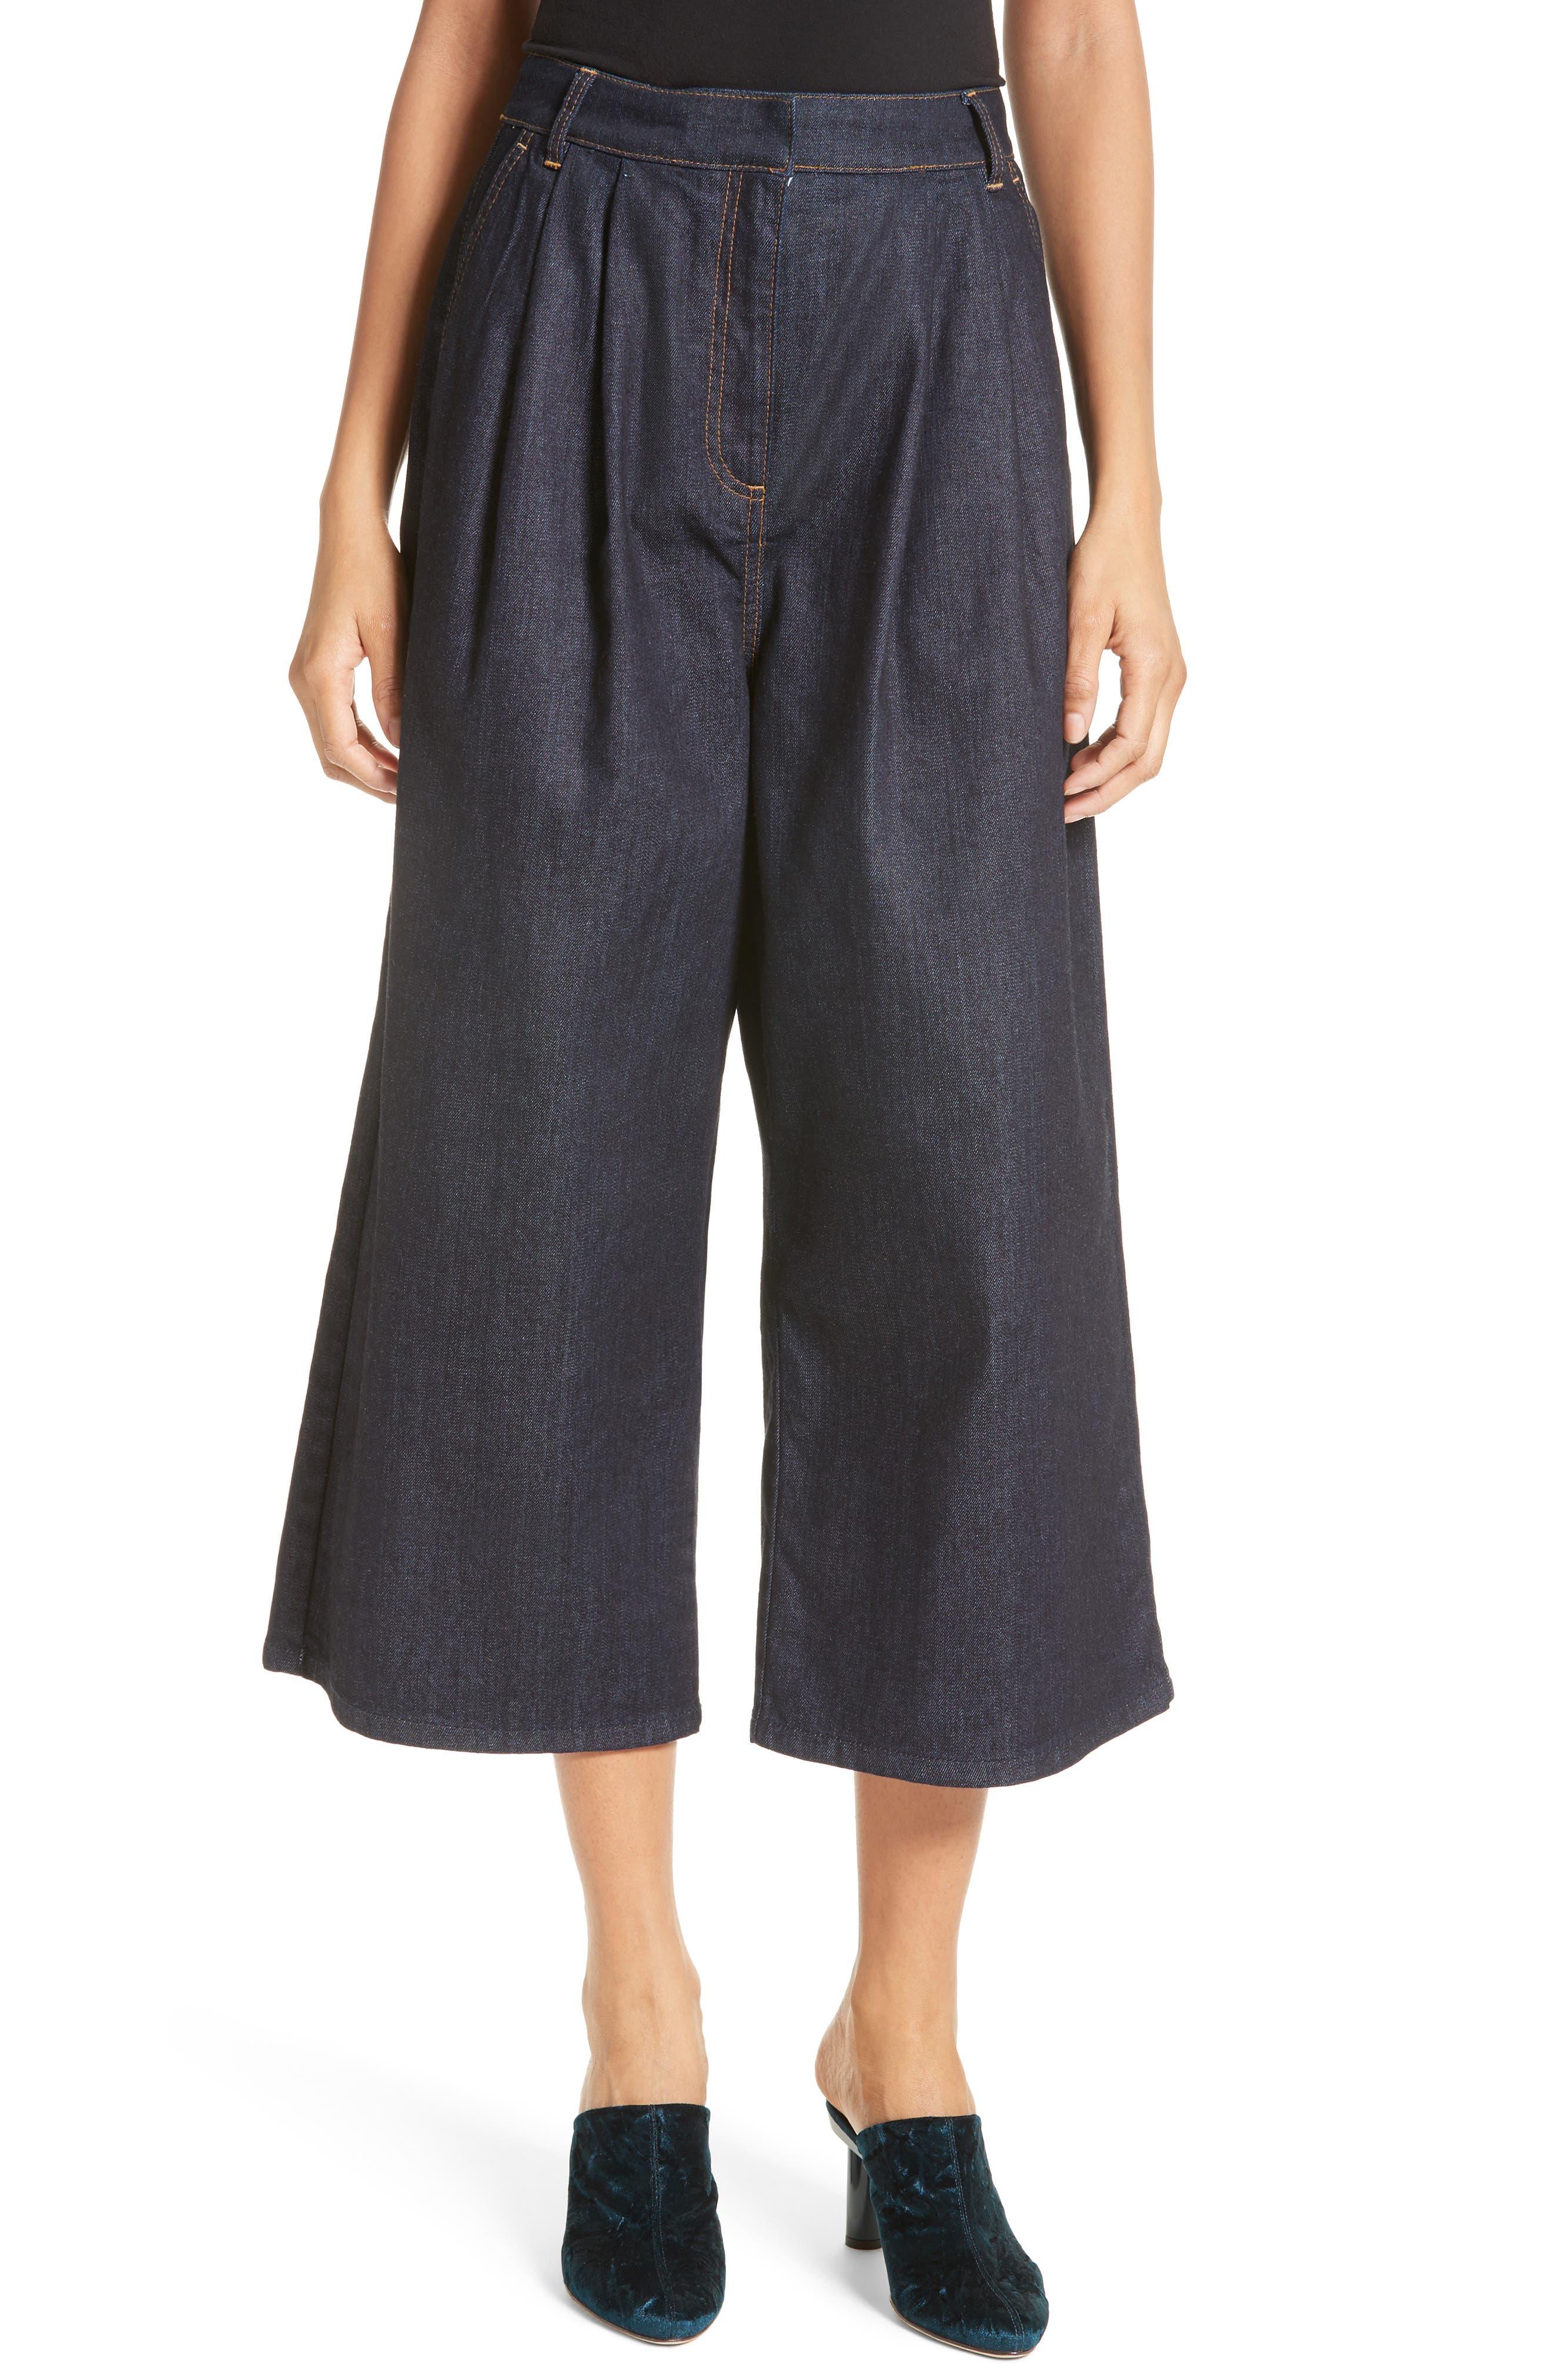 Sam High Waist Culotte Jeans,                         Main,                         color, 401